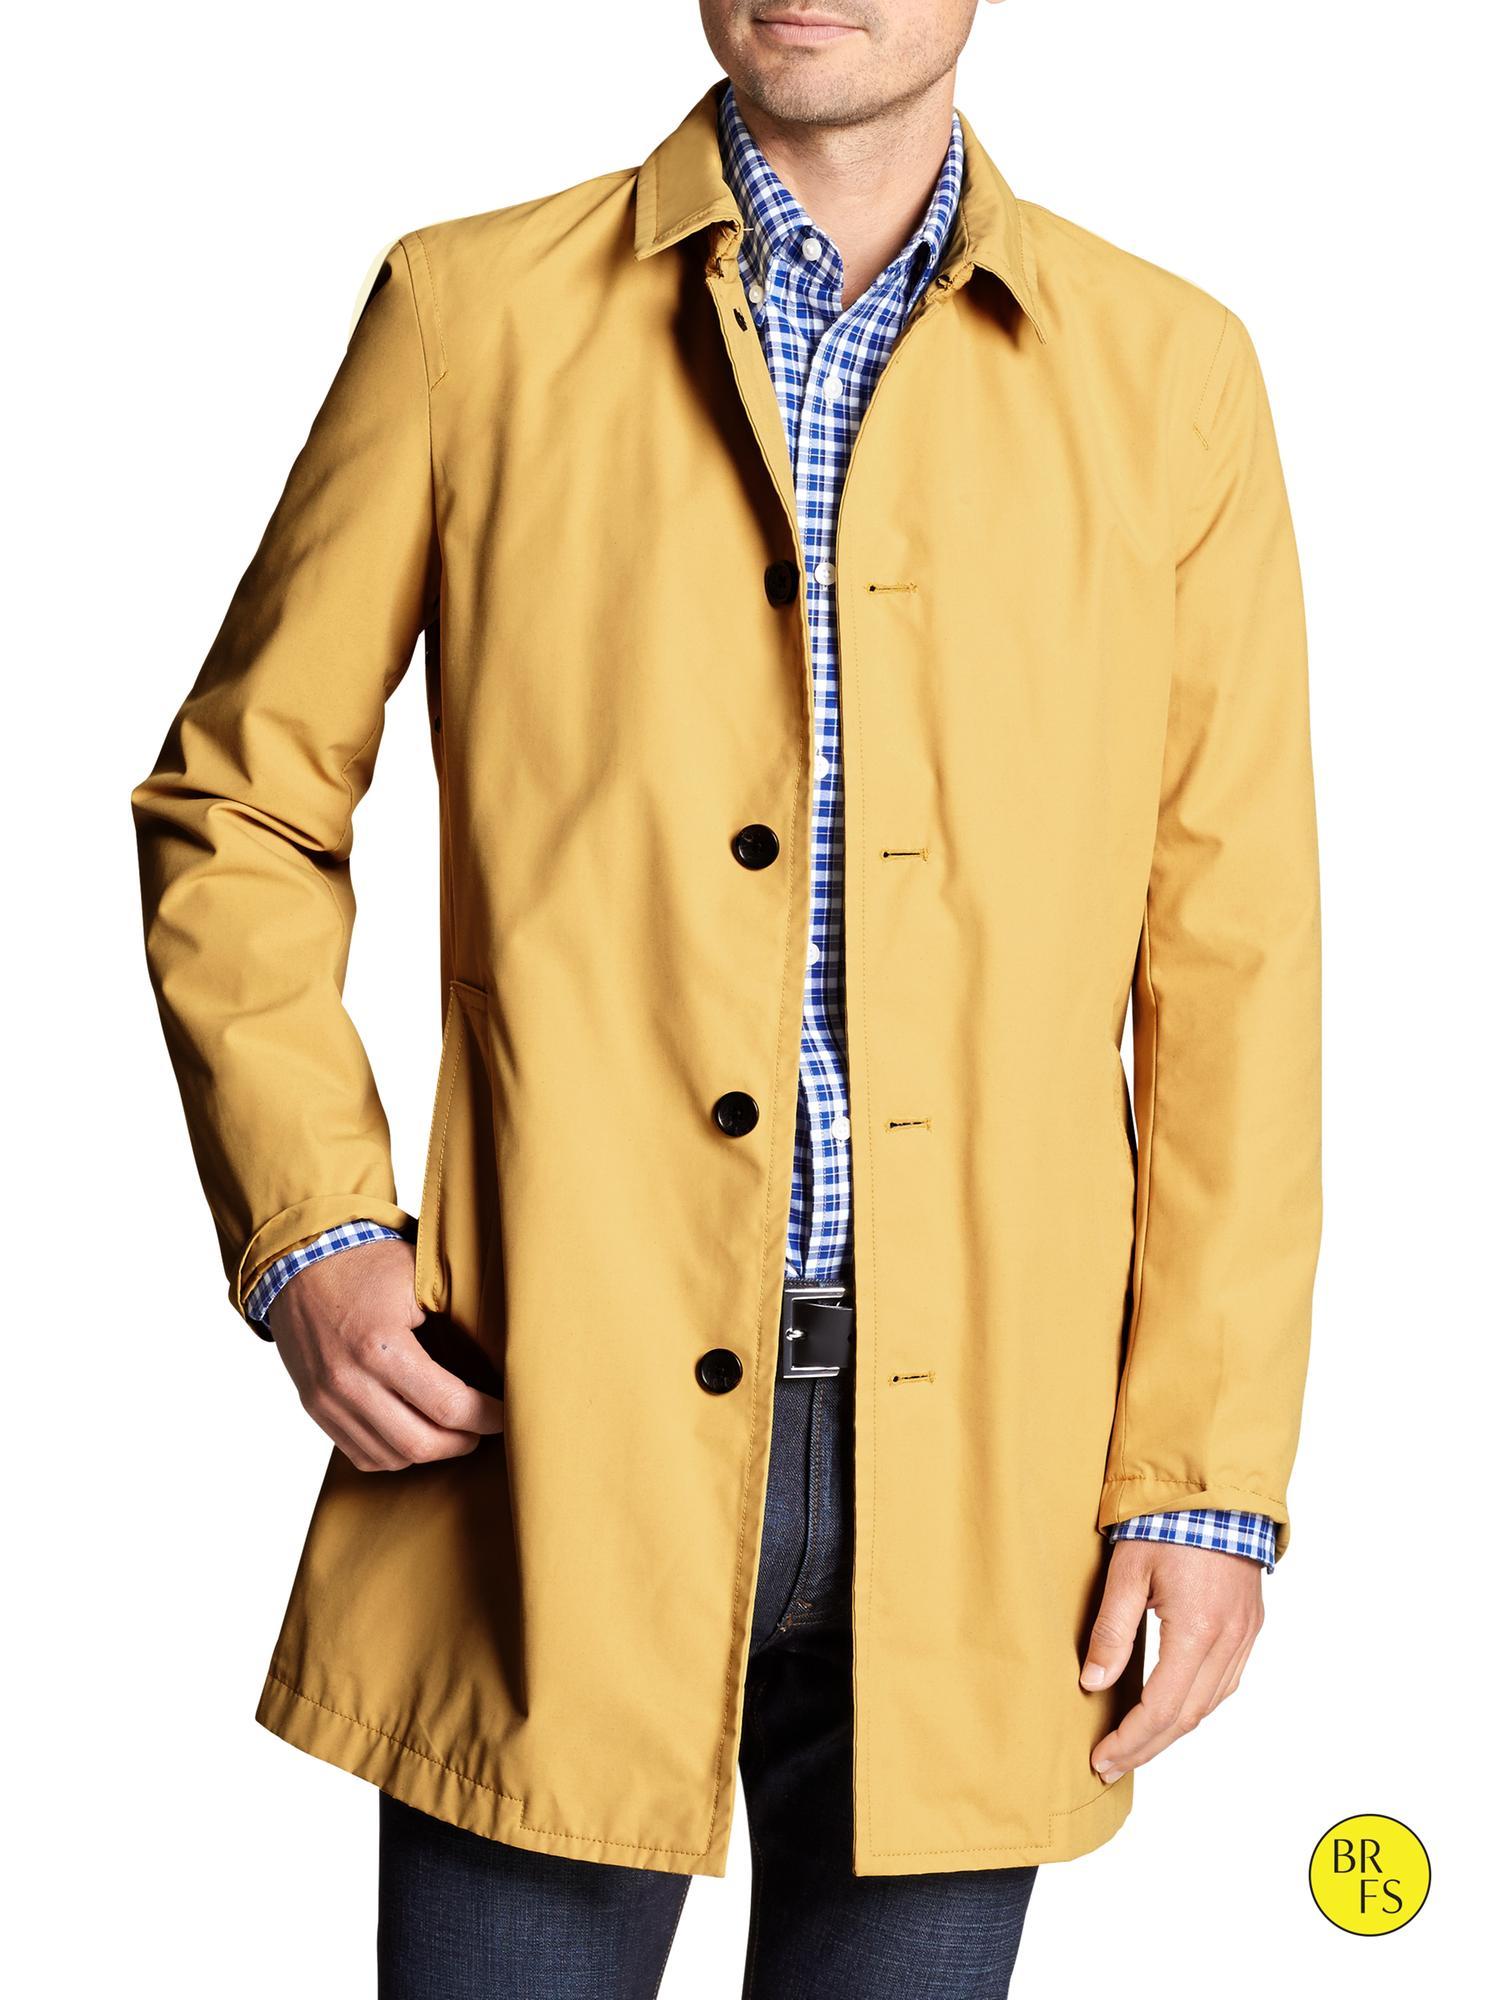 Banana Republic Factory Khaki Mac Jacket In Yellow For Men